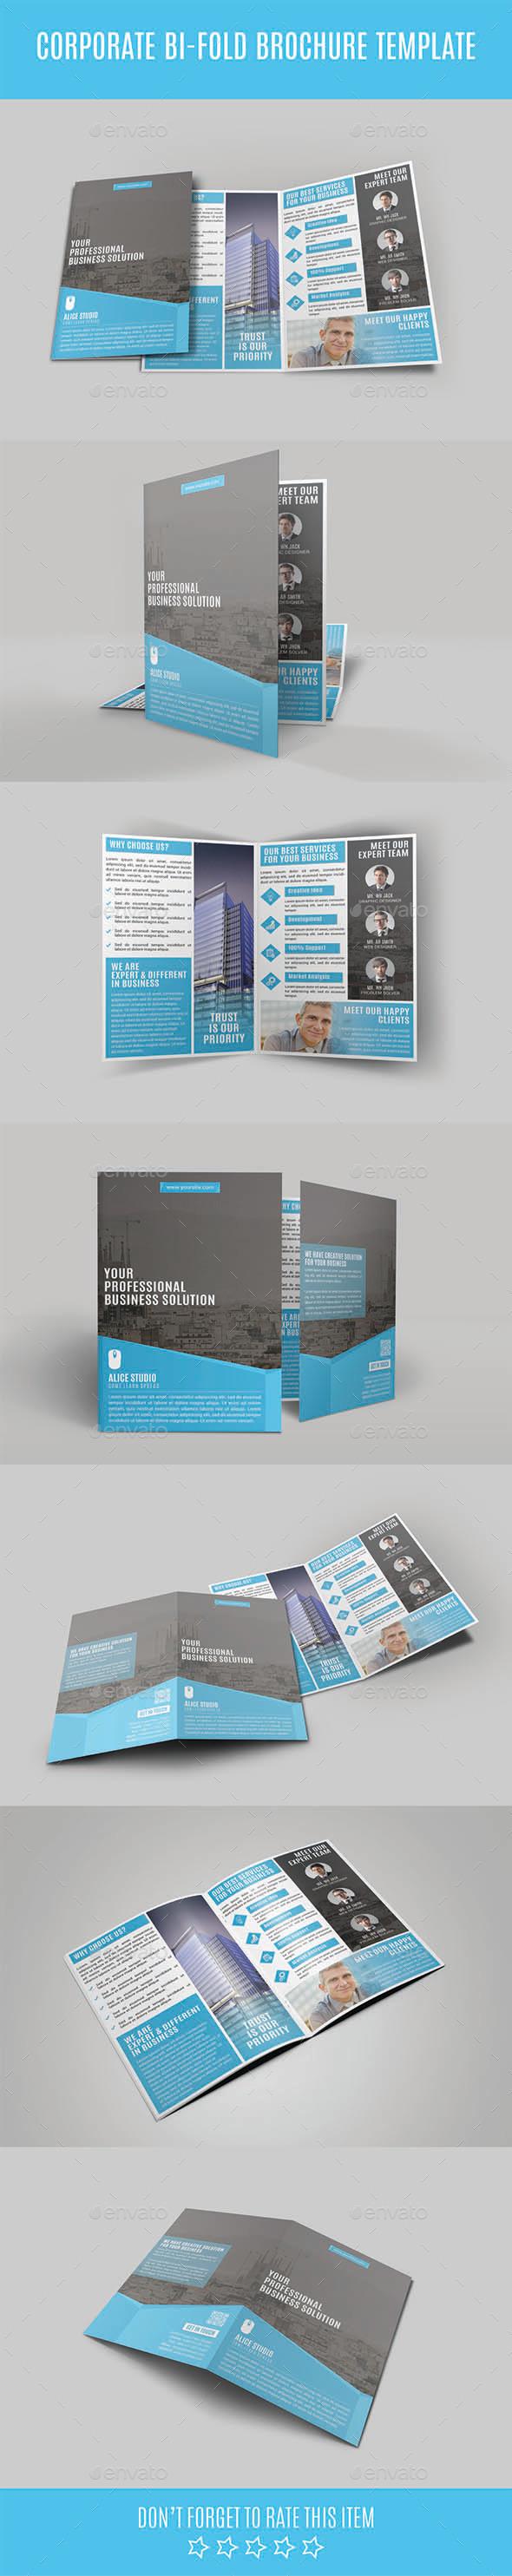 GraphicRiver Corporate Bi-Fold Brochure Template 10994616